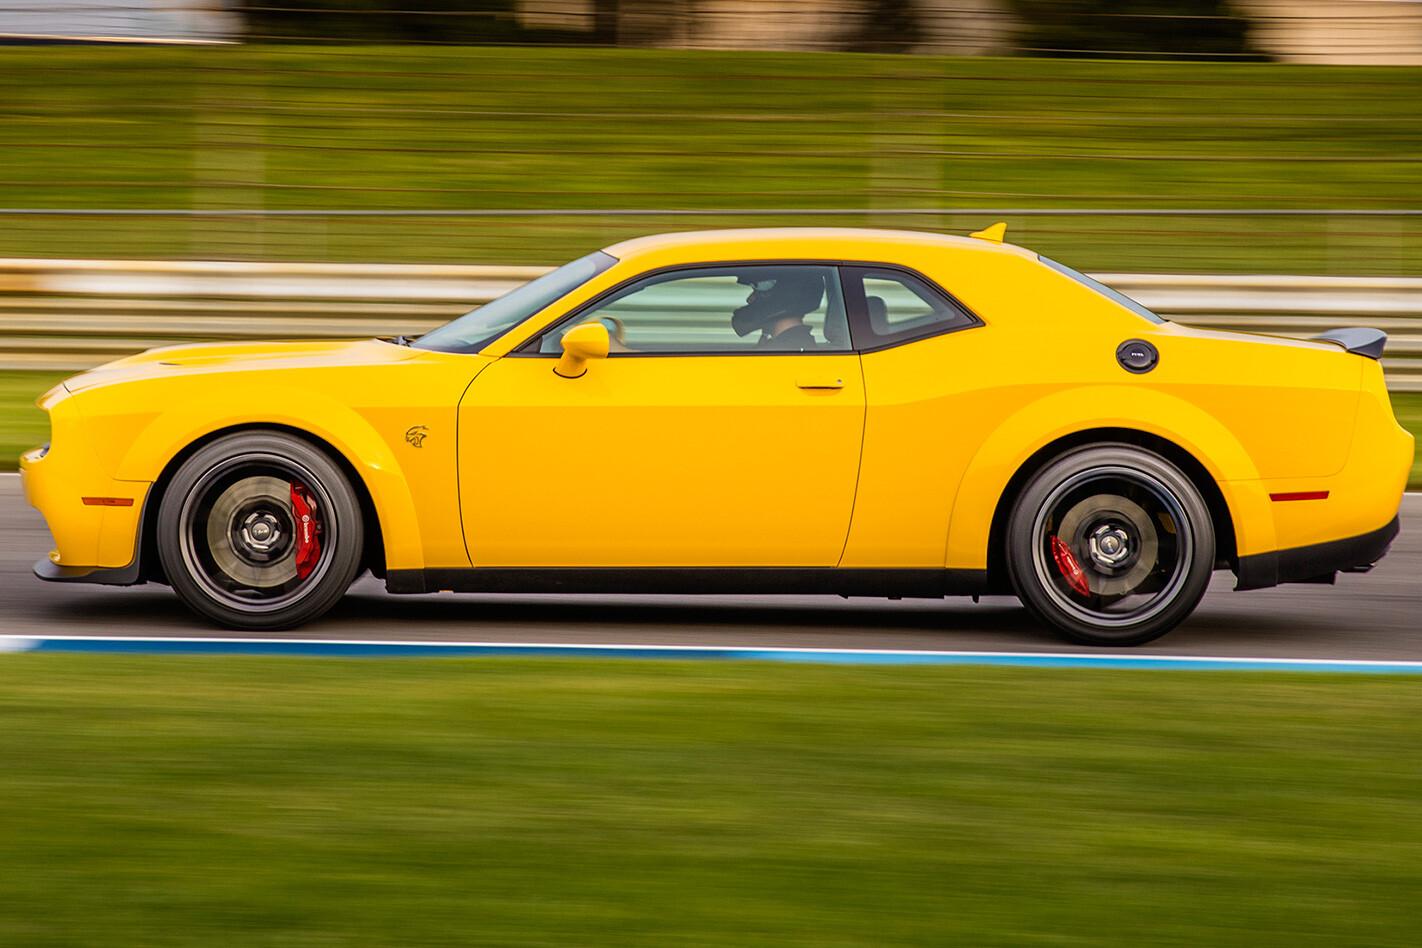 2018 Dodge Challenger Hellcat Widebody side profile